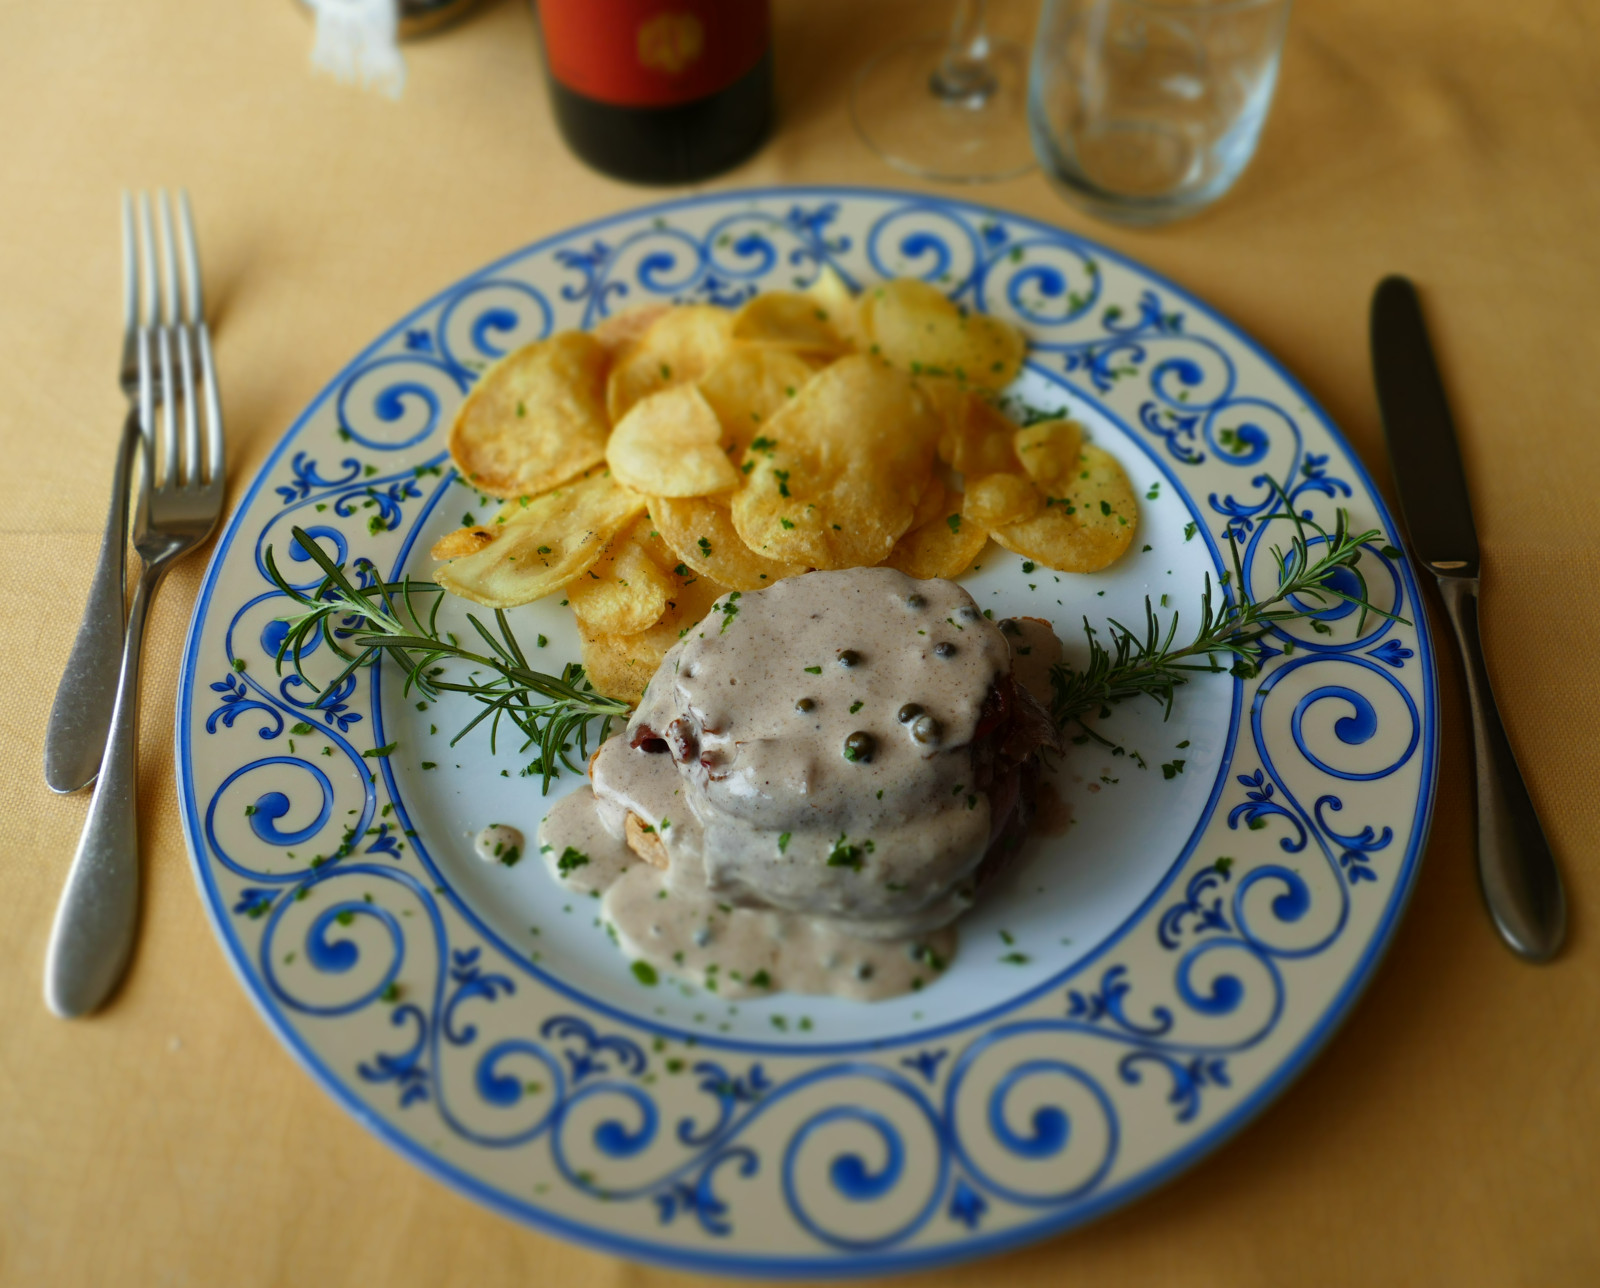 Filetto di Cinta Senese in Crema al Pepe di Sezchuan con Sfoglie di Patate Fritte